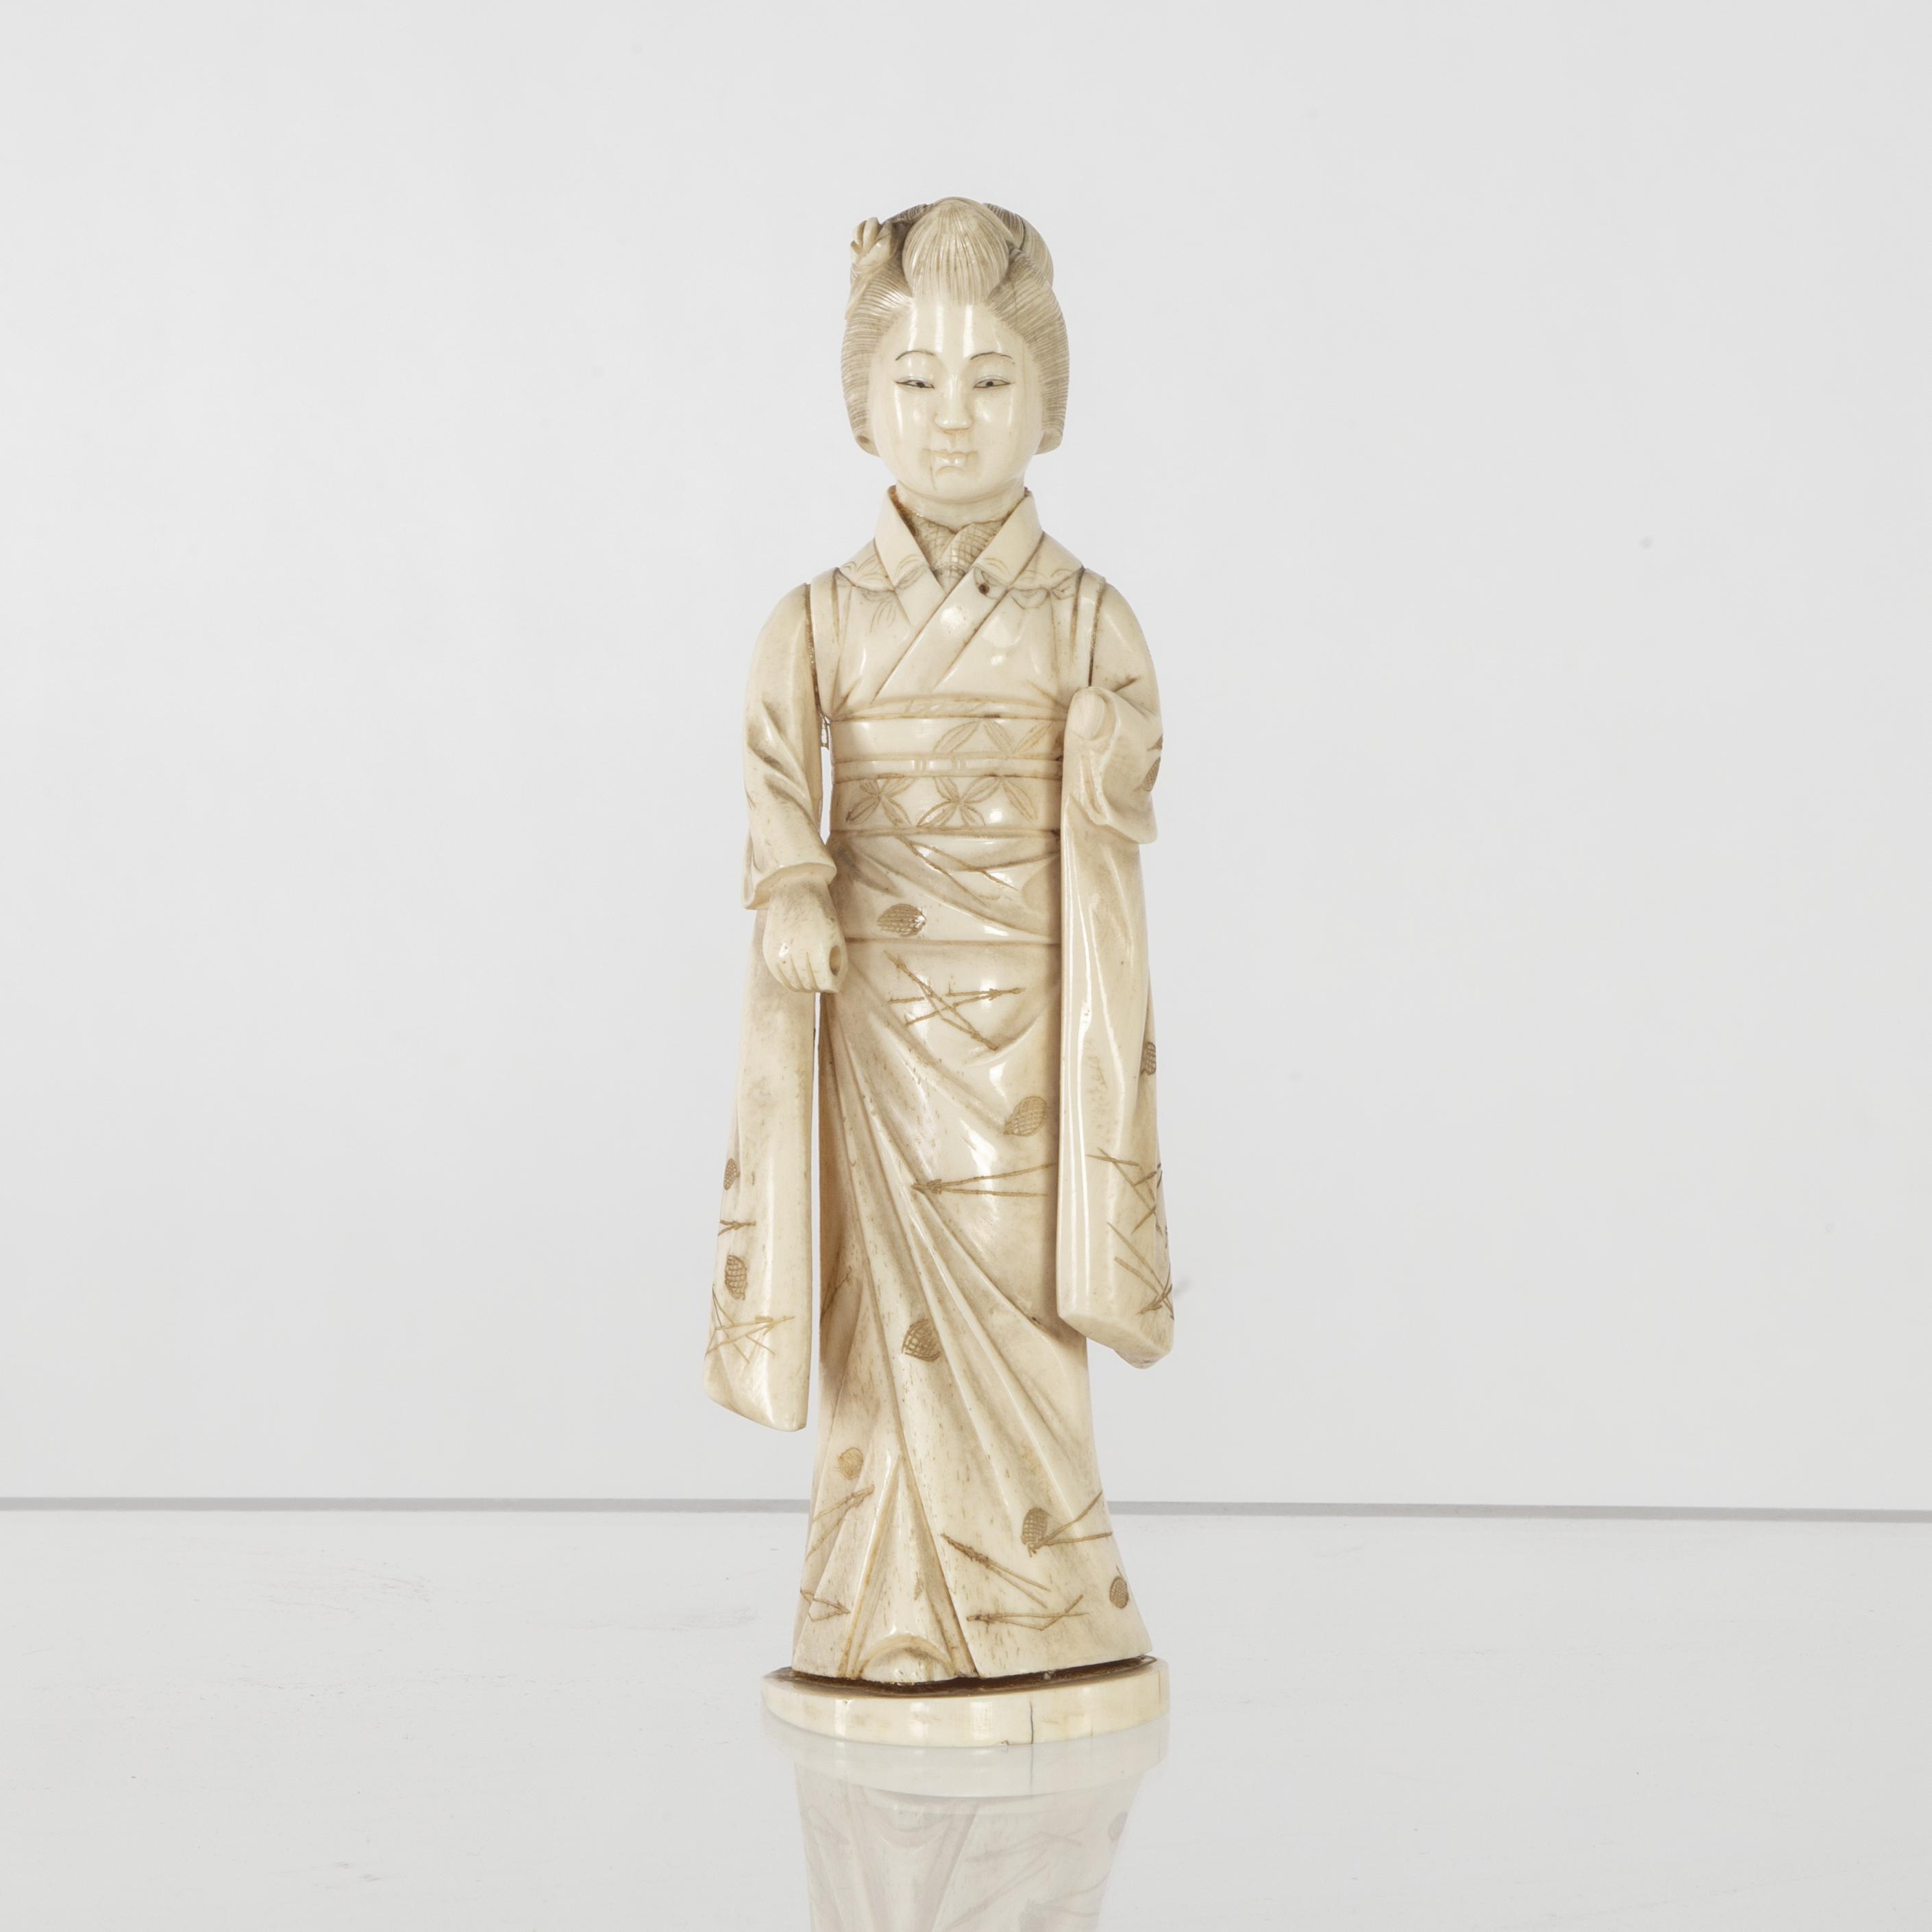 Japanese Meiji School Early 20th Century Geisha Asiatica Auctionet